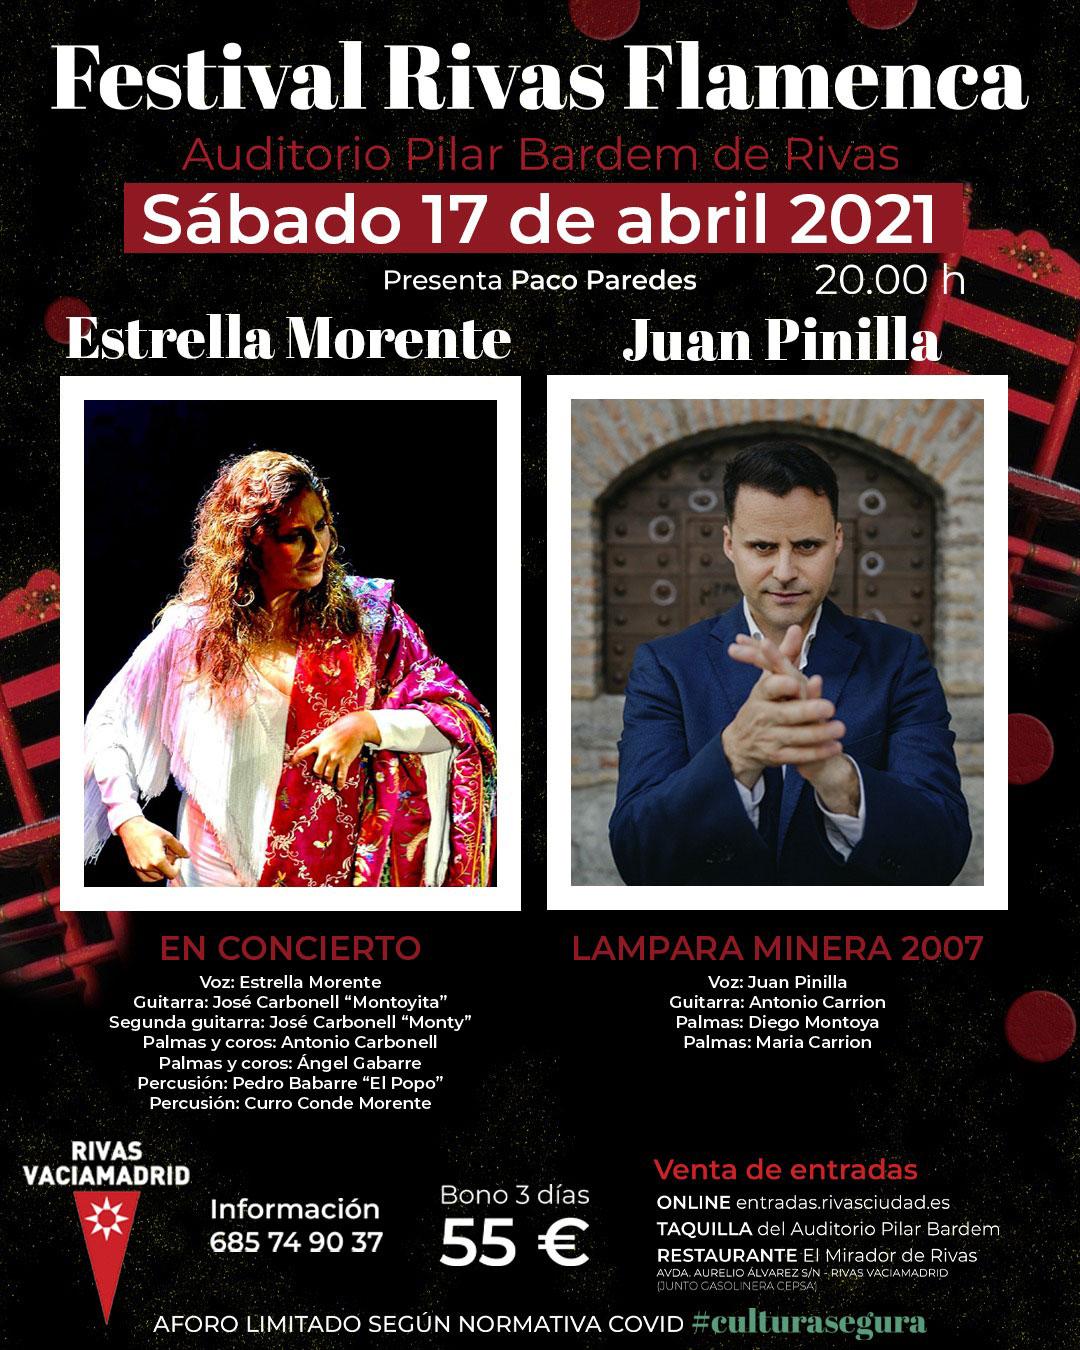 Rivas Flamenca 2021 - Estrella Morente / Juan Pinilla